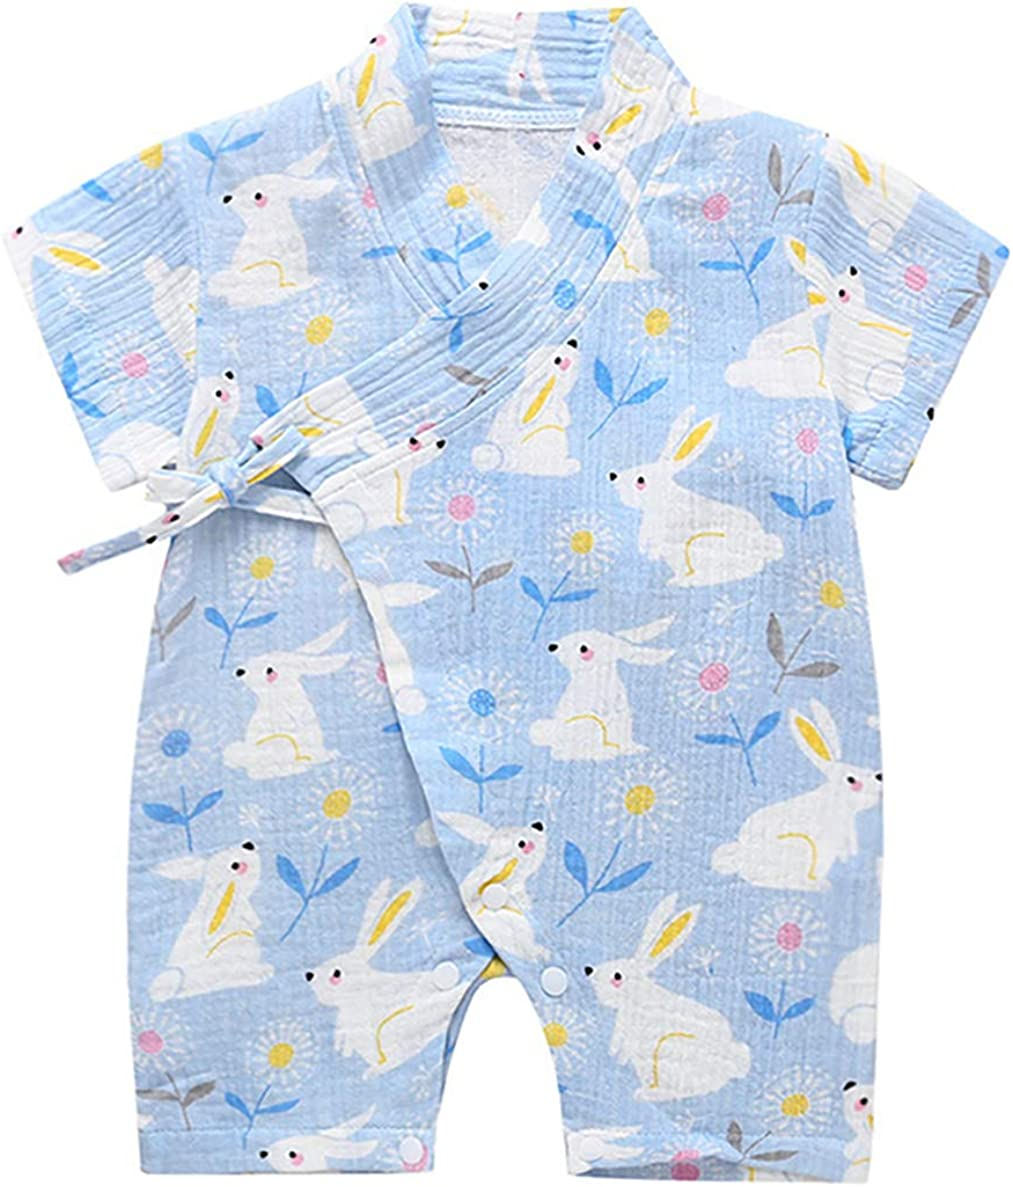 12-24 Months, Rabbit PAUBOLI Kimono Robe Newborn Cotton Yarn Robe Baby Romper Infant Japanese Pajamas